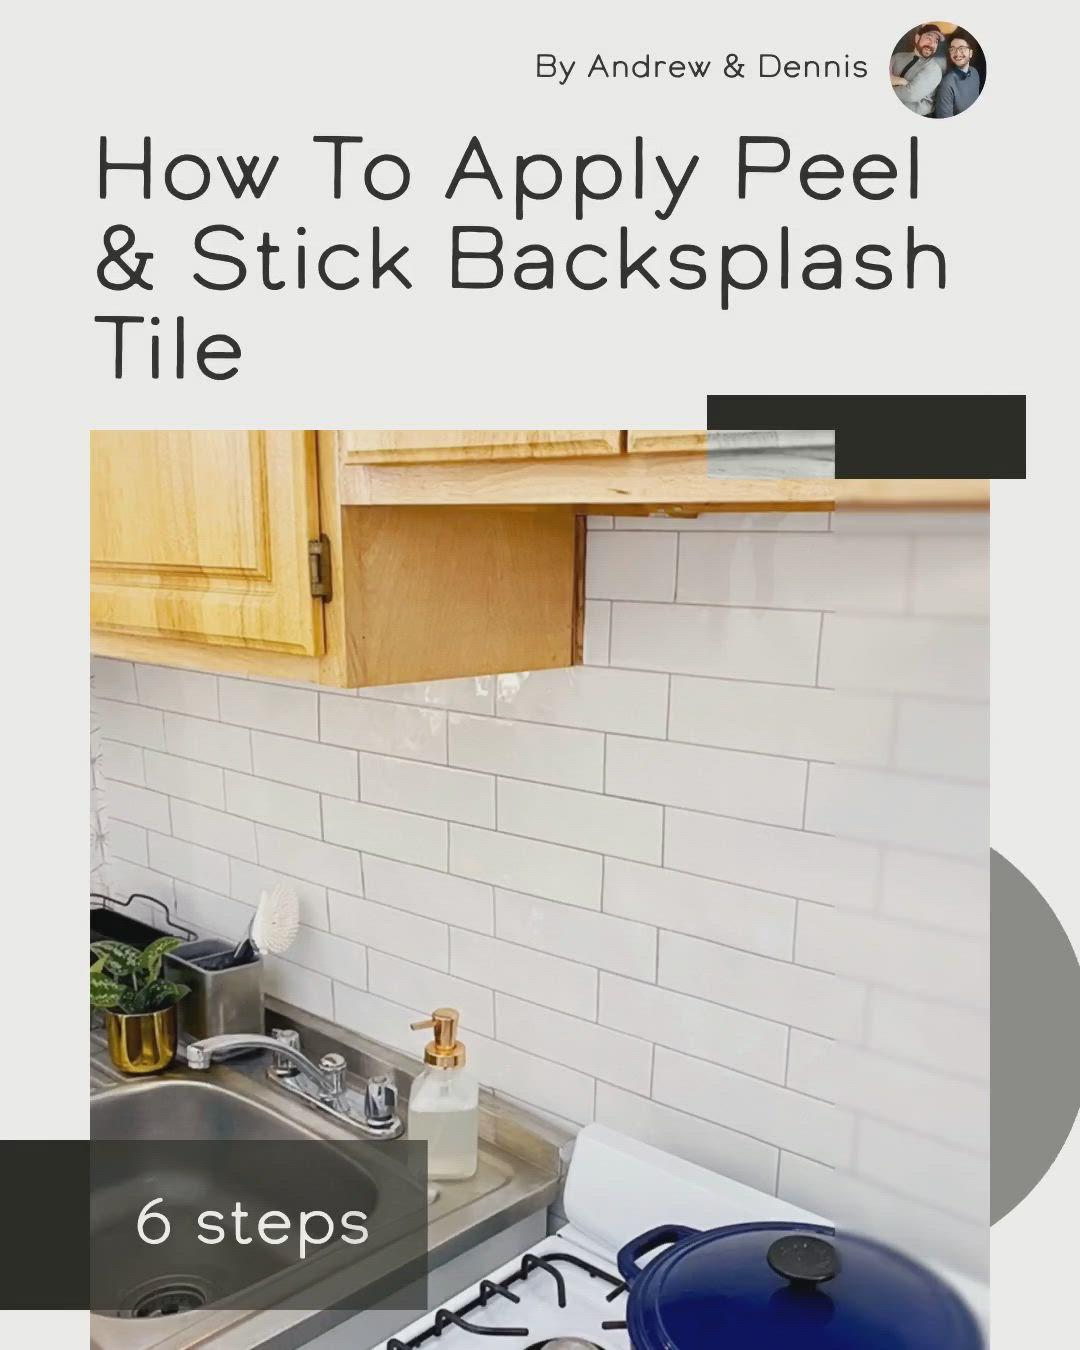 How To Apply Peel Stick Backsplash Tile Video Video Peel Stick Backsplash Diy Tile Backsplash Backsplash